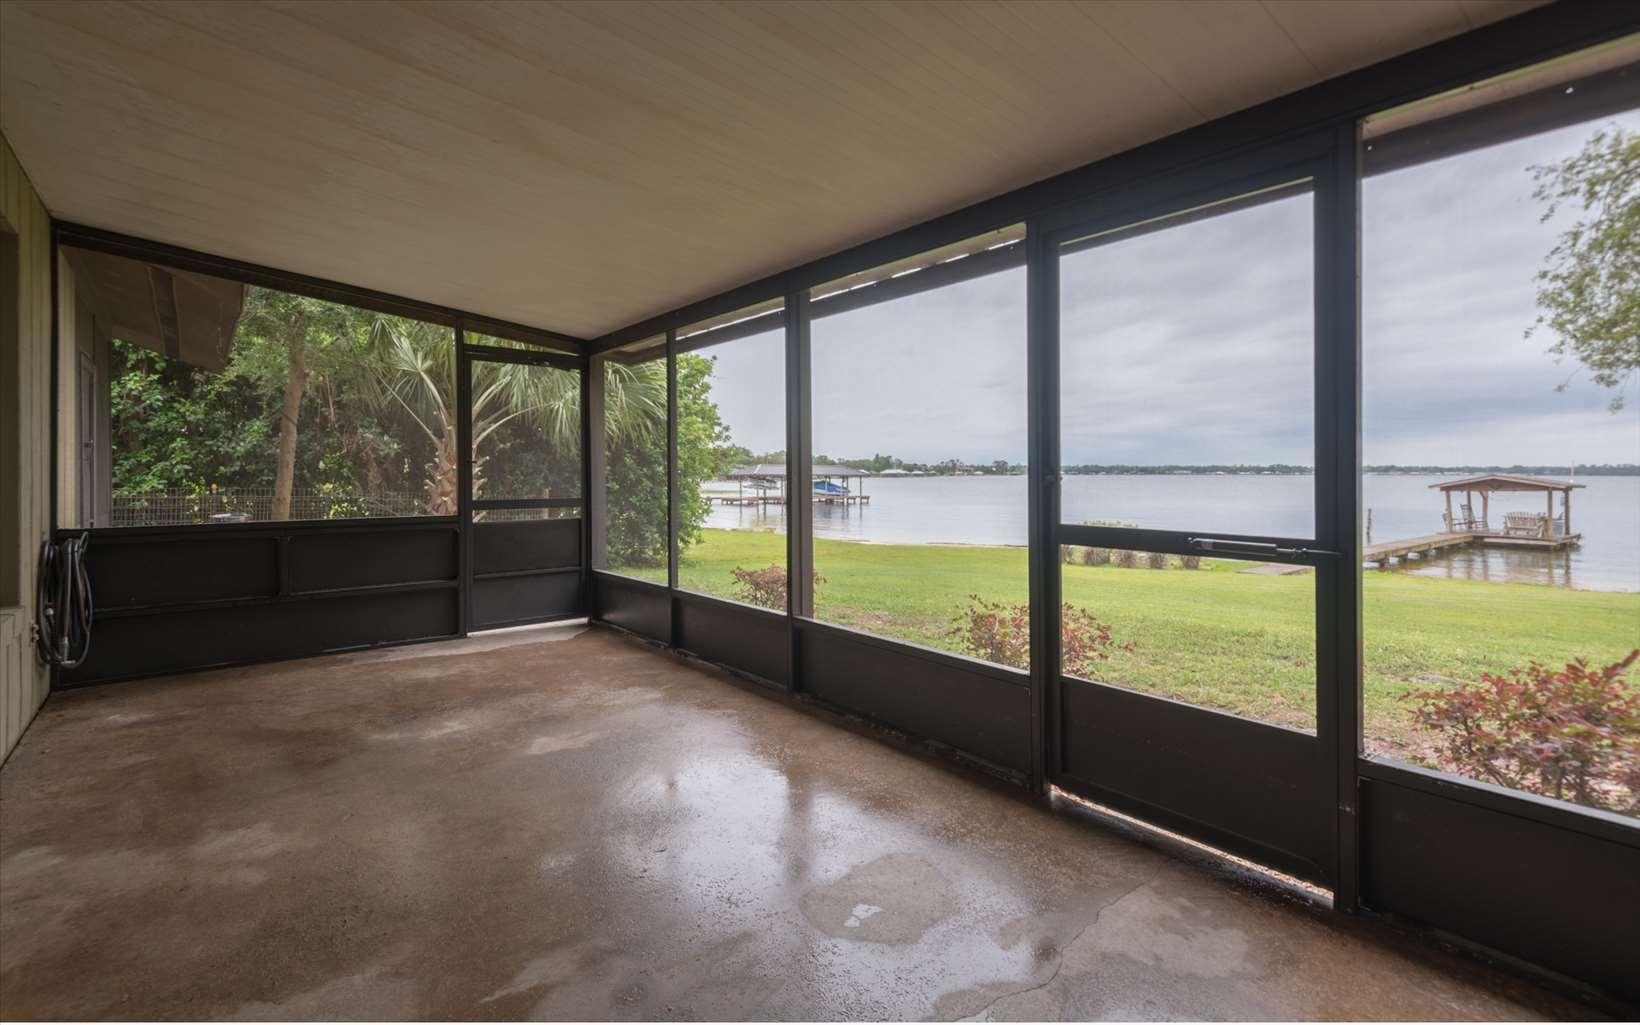 169 Catfish Creek Rd, Lake Placid, FL 33852